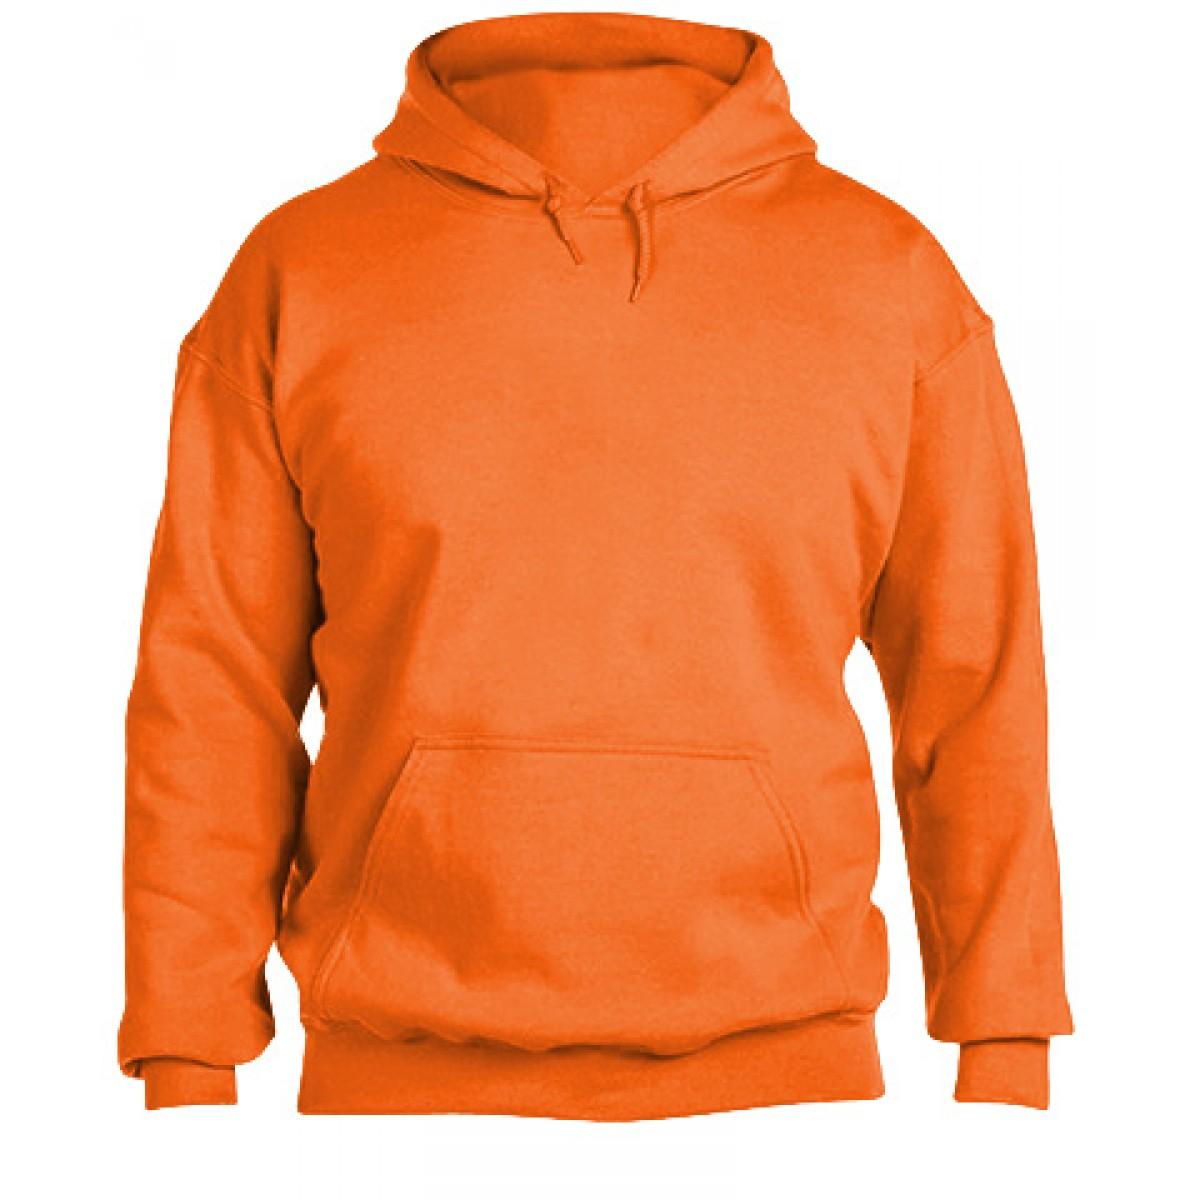 Solid Hooded Sweatshirt  50/50 Heavy Blend-Safety Orange-S